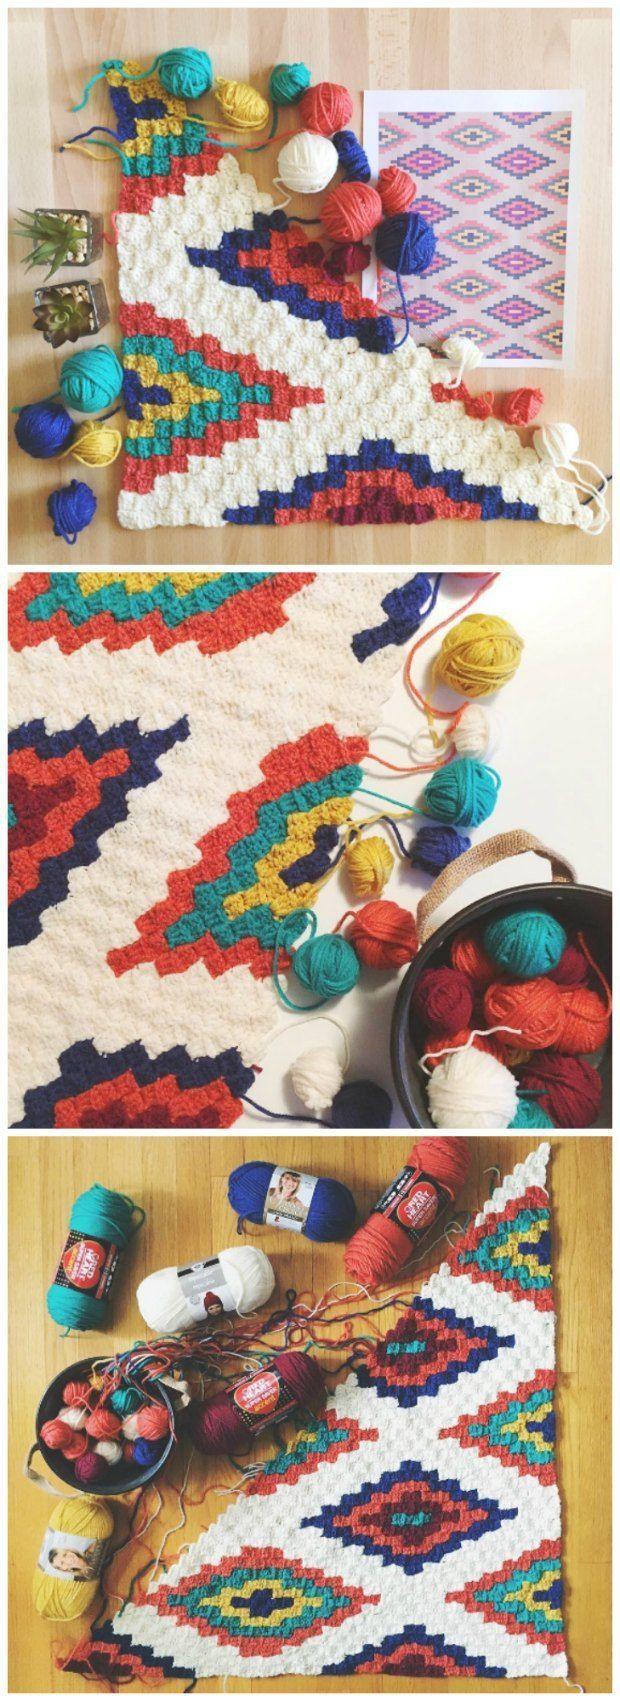 Corner To Corner Crochet Southwestern Afghan Throw blanket | Decken ...